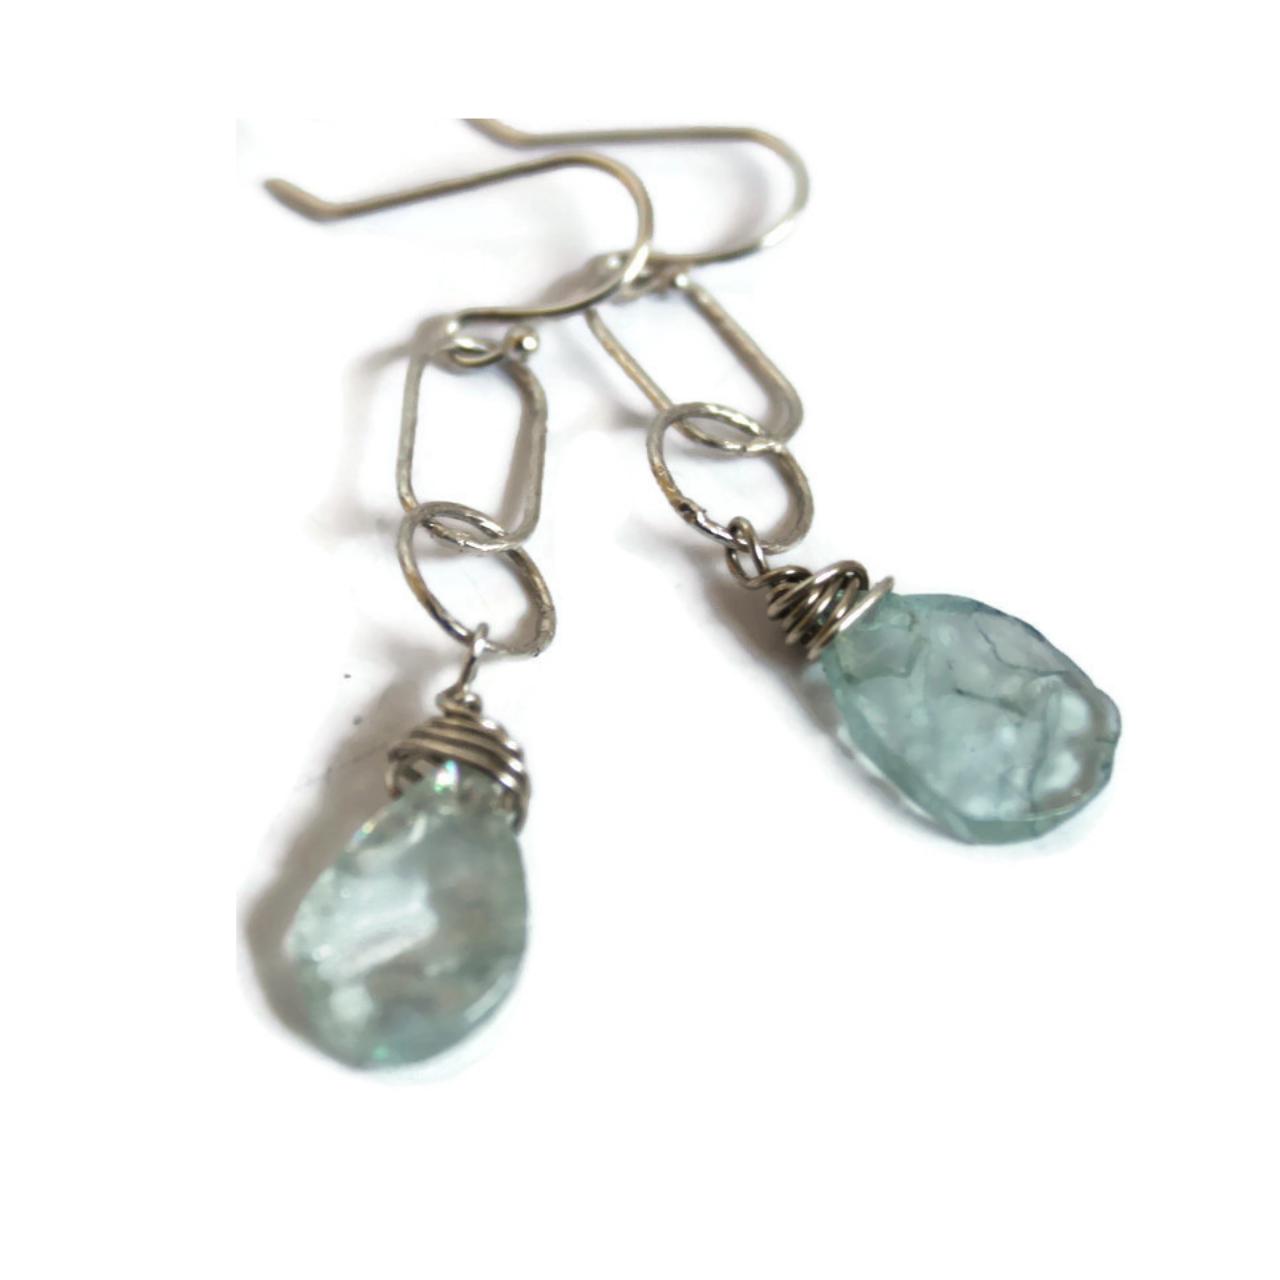 sterling-chain-aquamarine-earrings-on-white-background